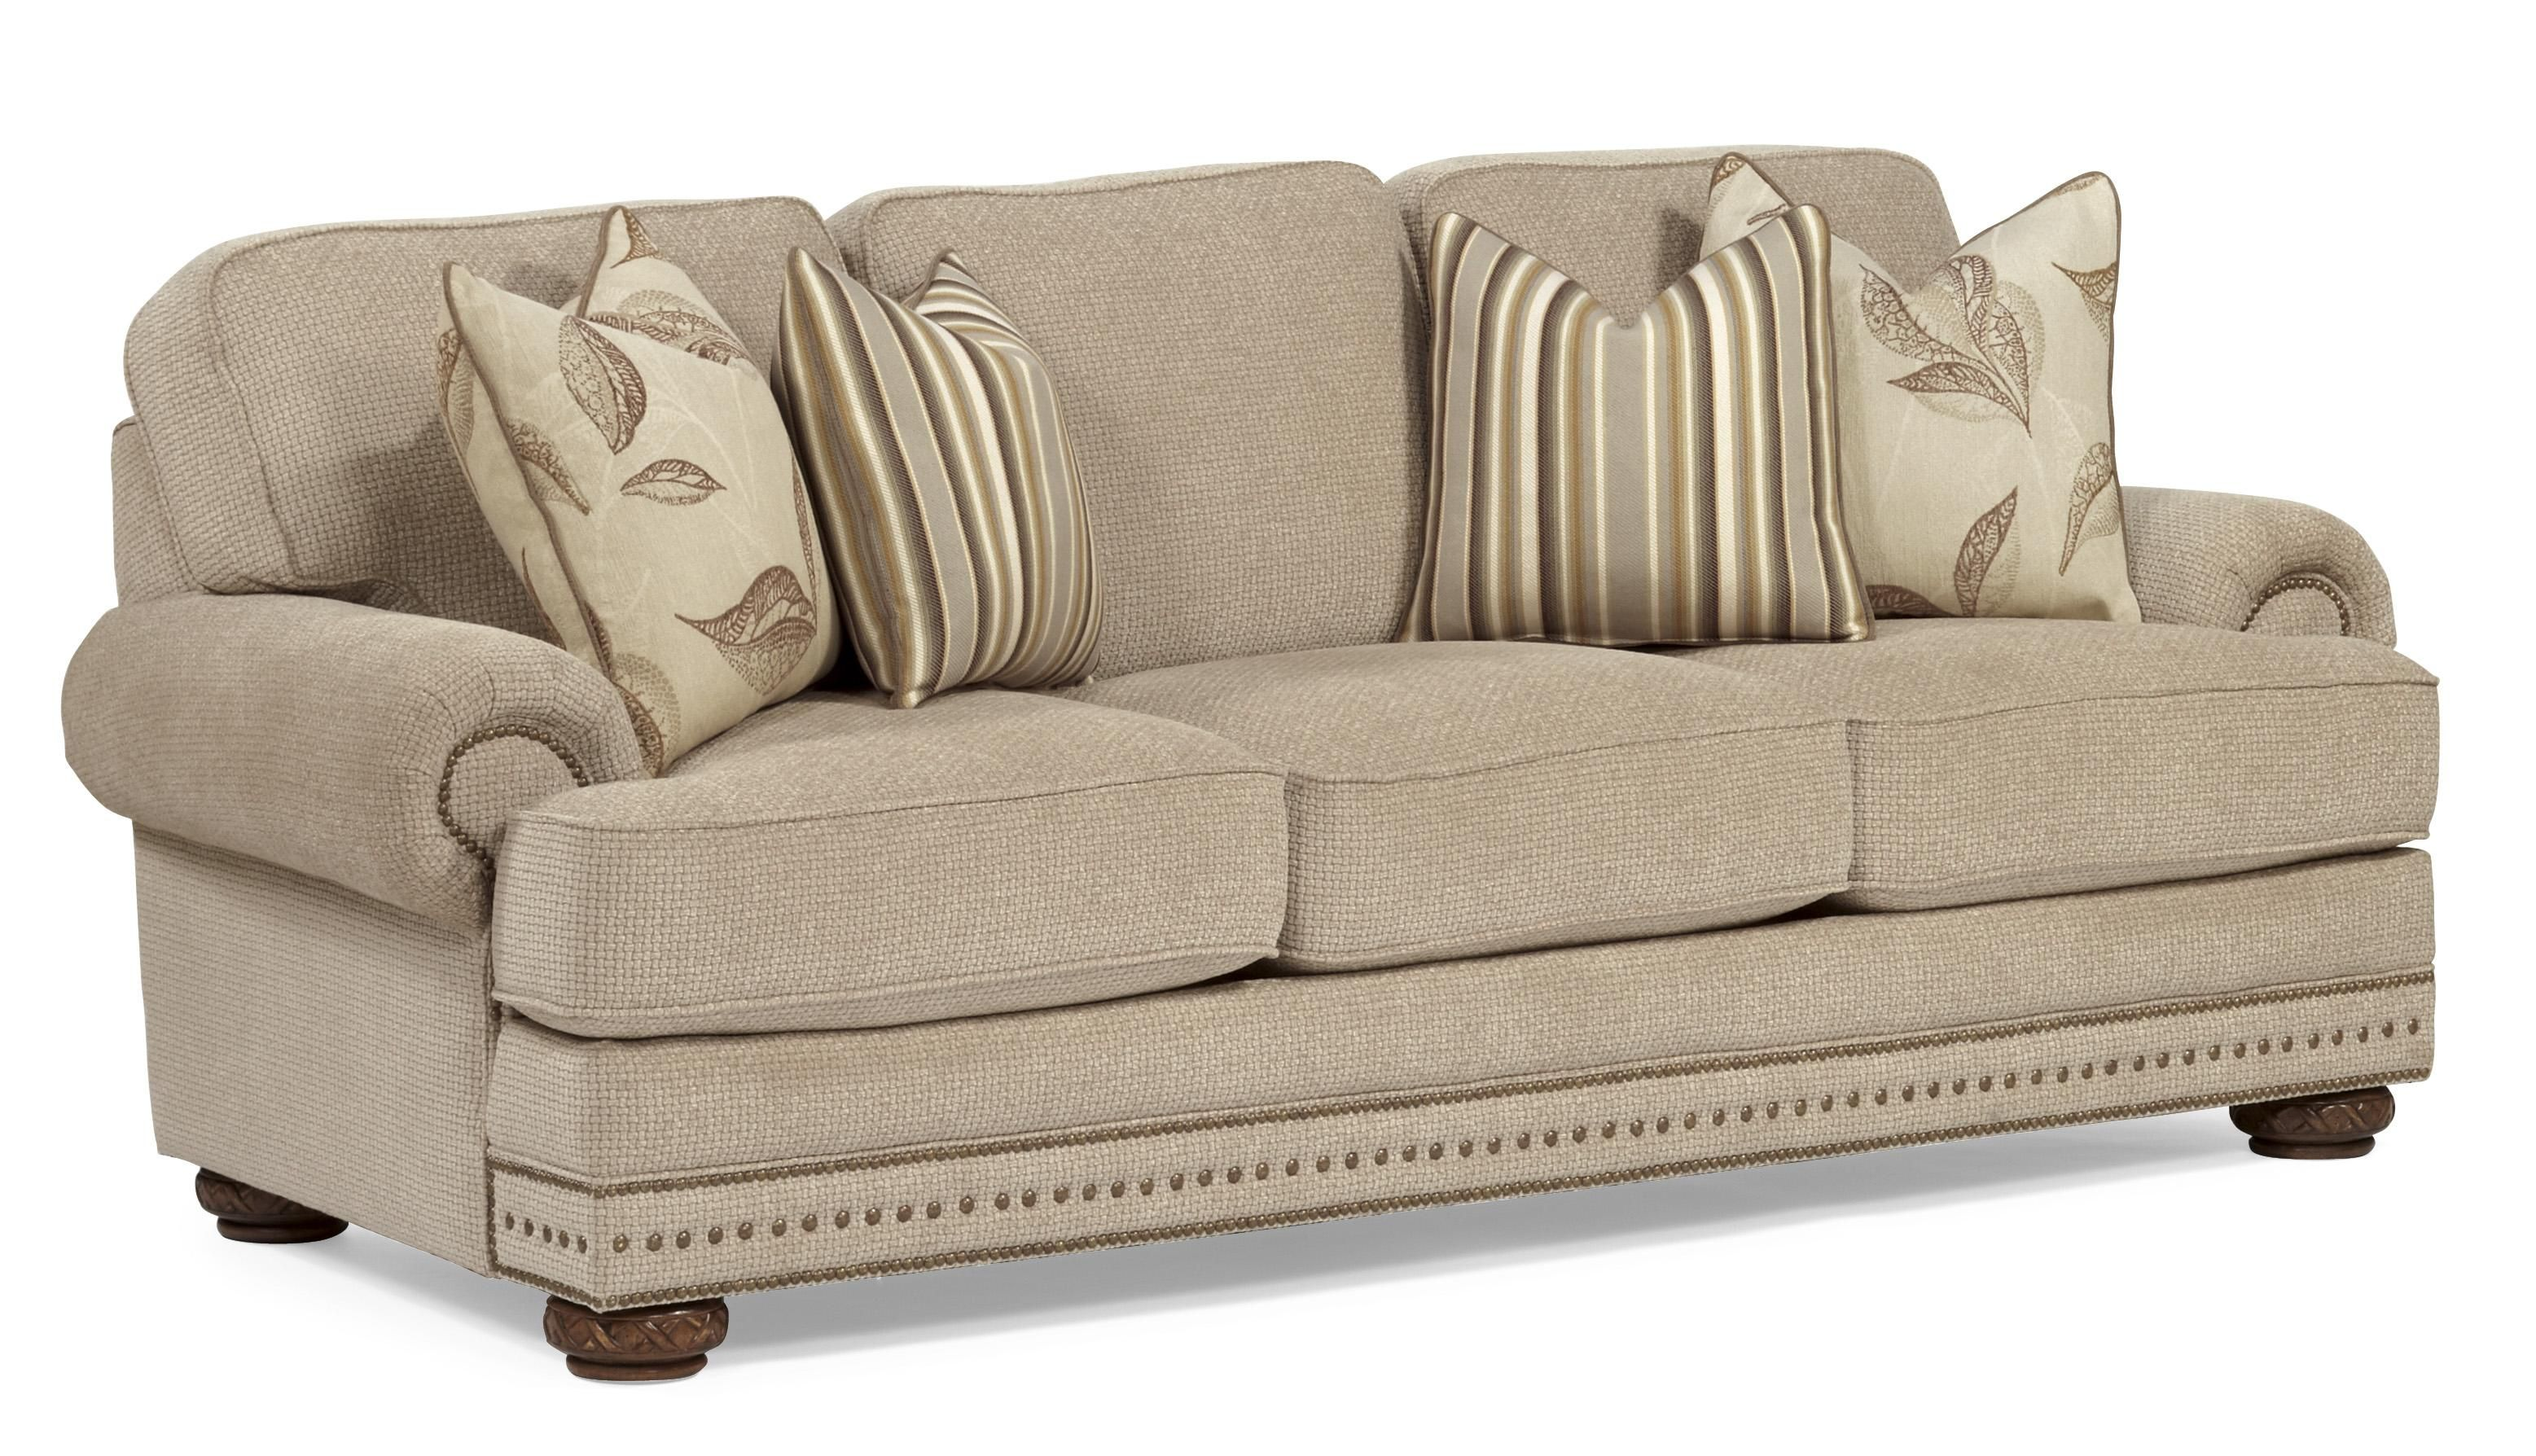 That S My Style Custom Sofa By Flexsteel Family Room